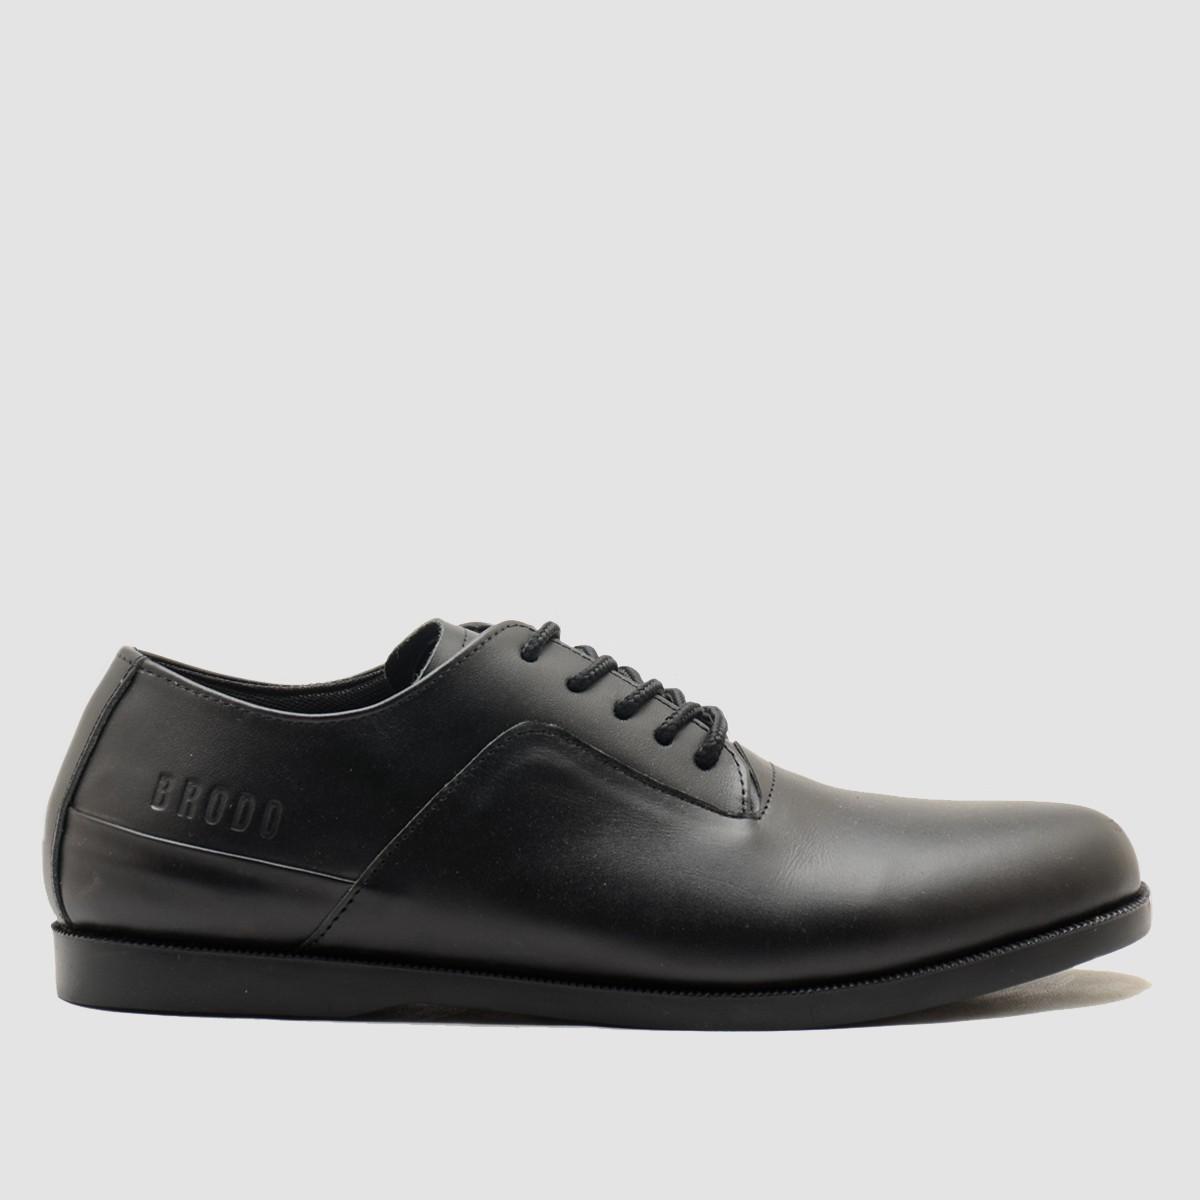 BRODO - Sepatu Pria Toba E+ Full Black